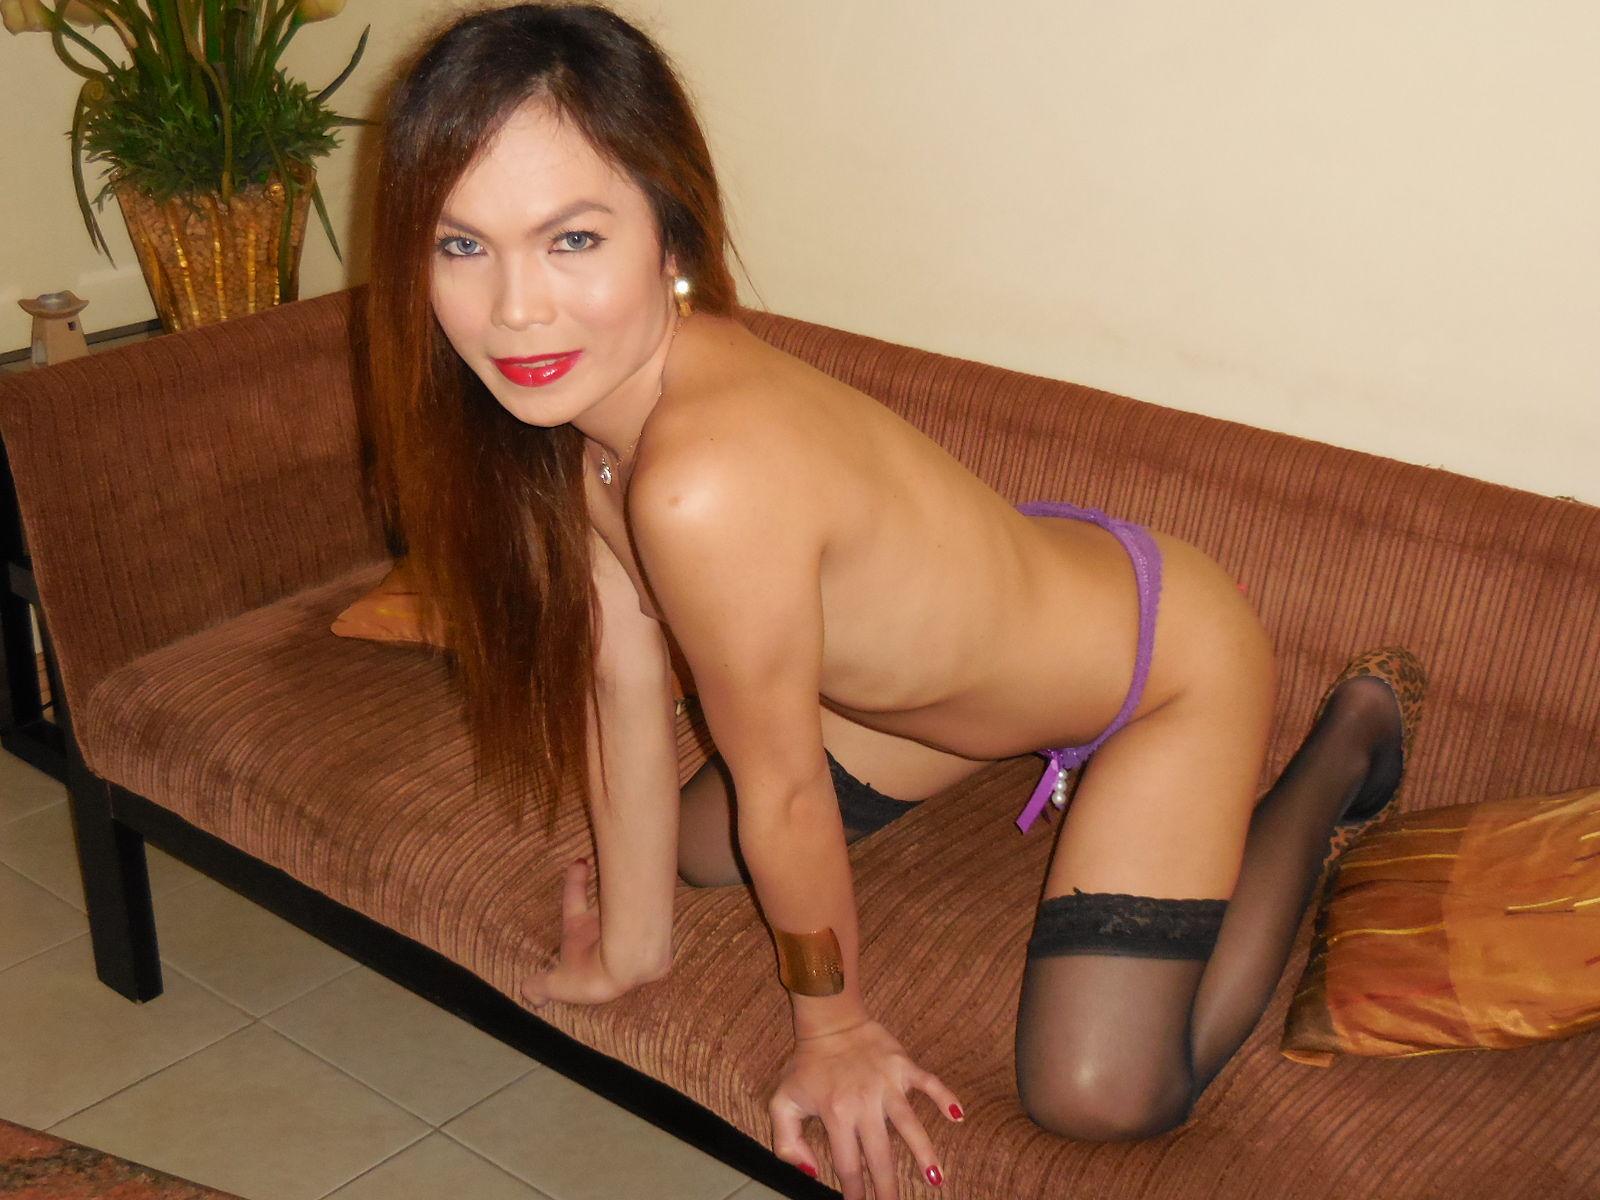 Manilla escorts 1st Night in Manila with an Escort from Sexyescortads -